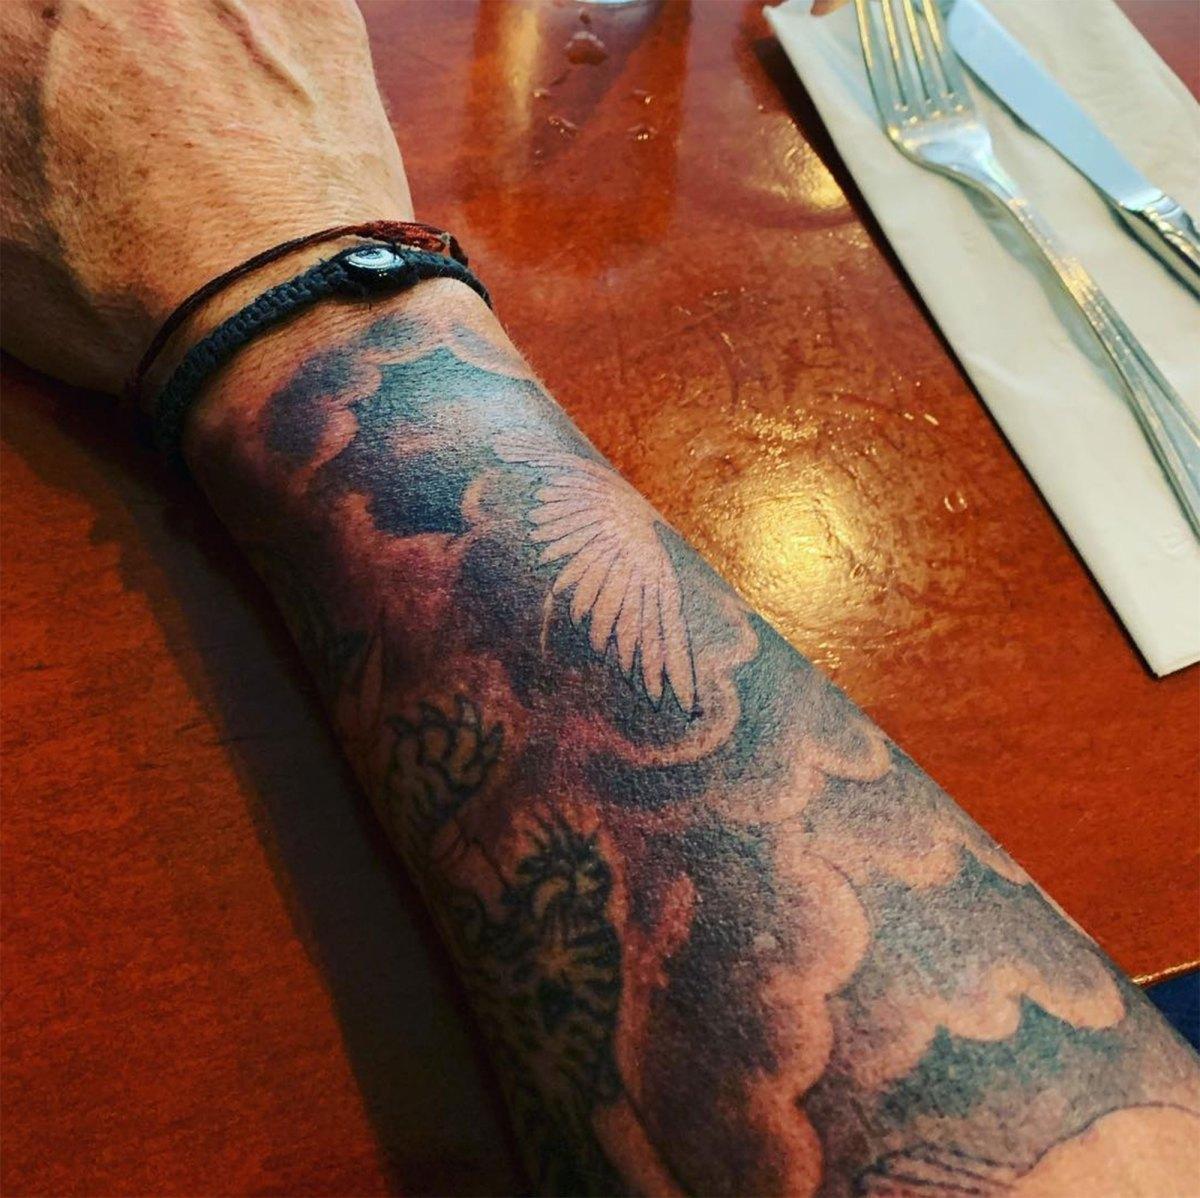 See Celebrities Craziest Tattoos Us Weekly